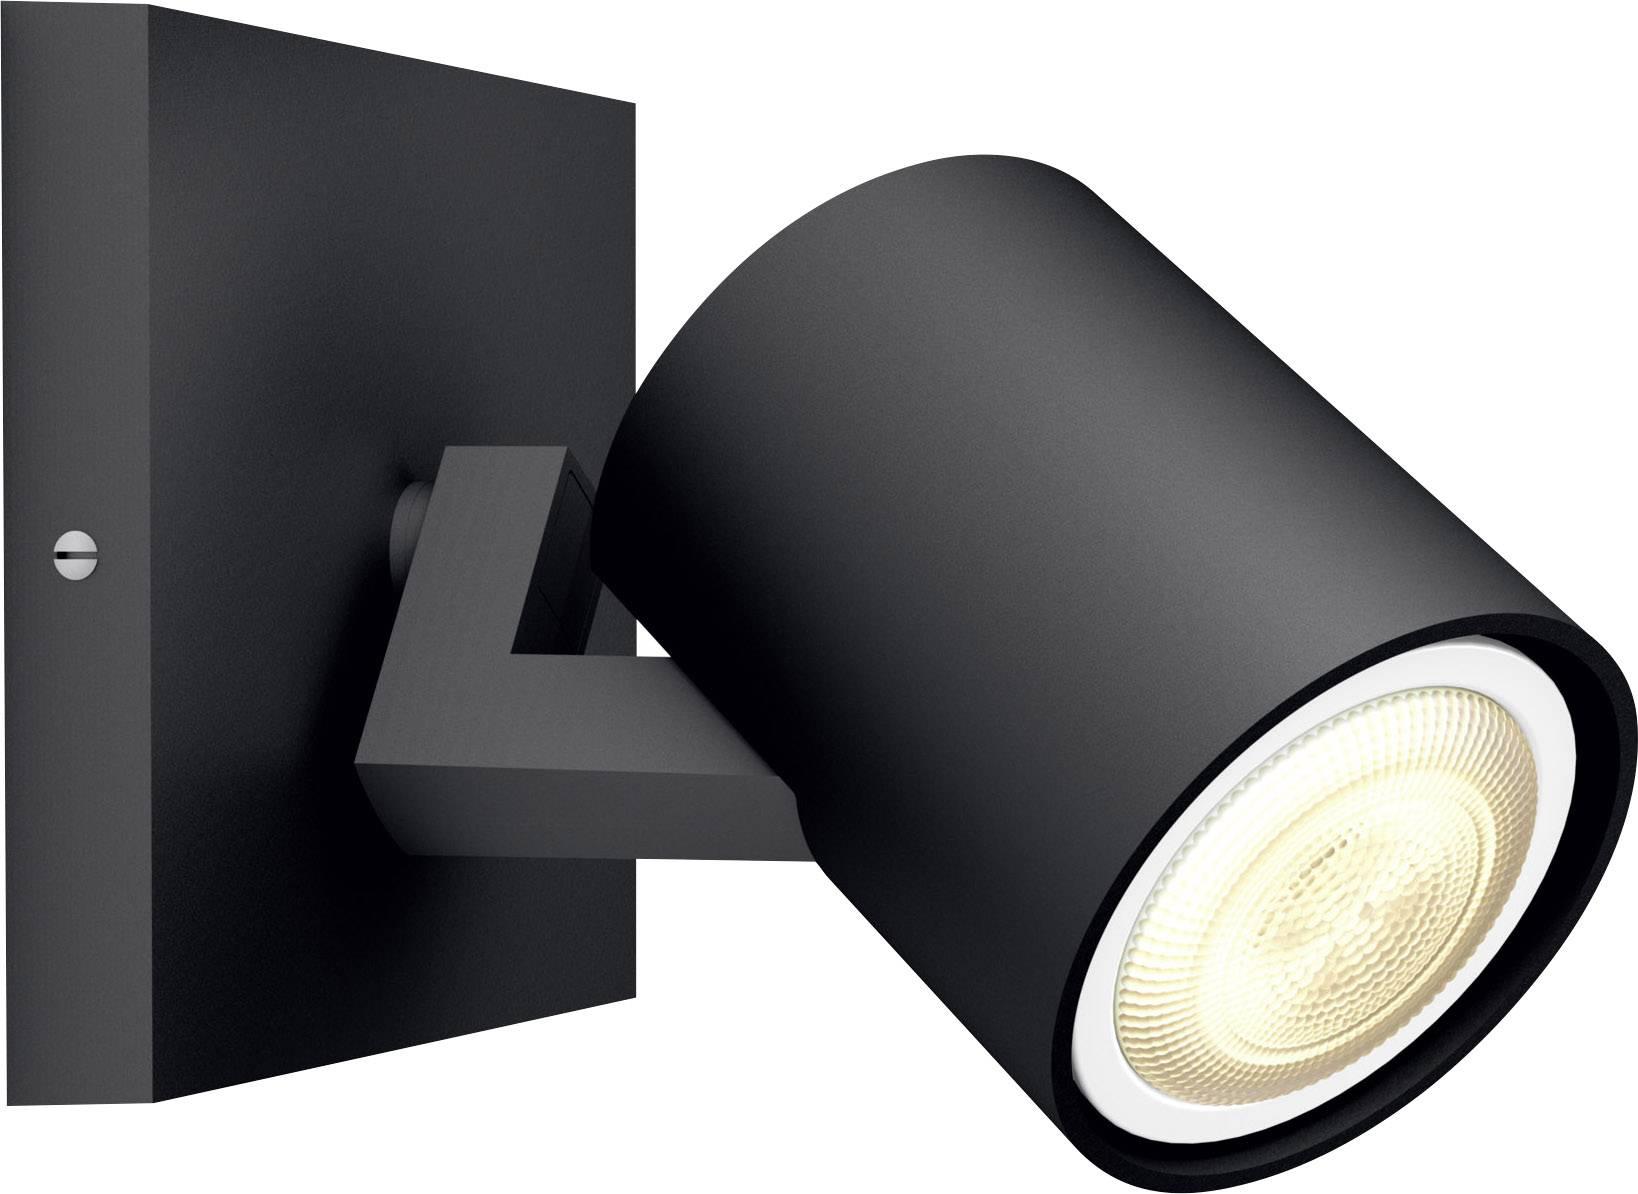 Philips Lighting Hue Espansion